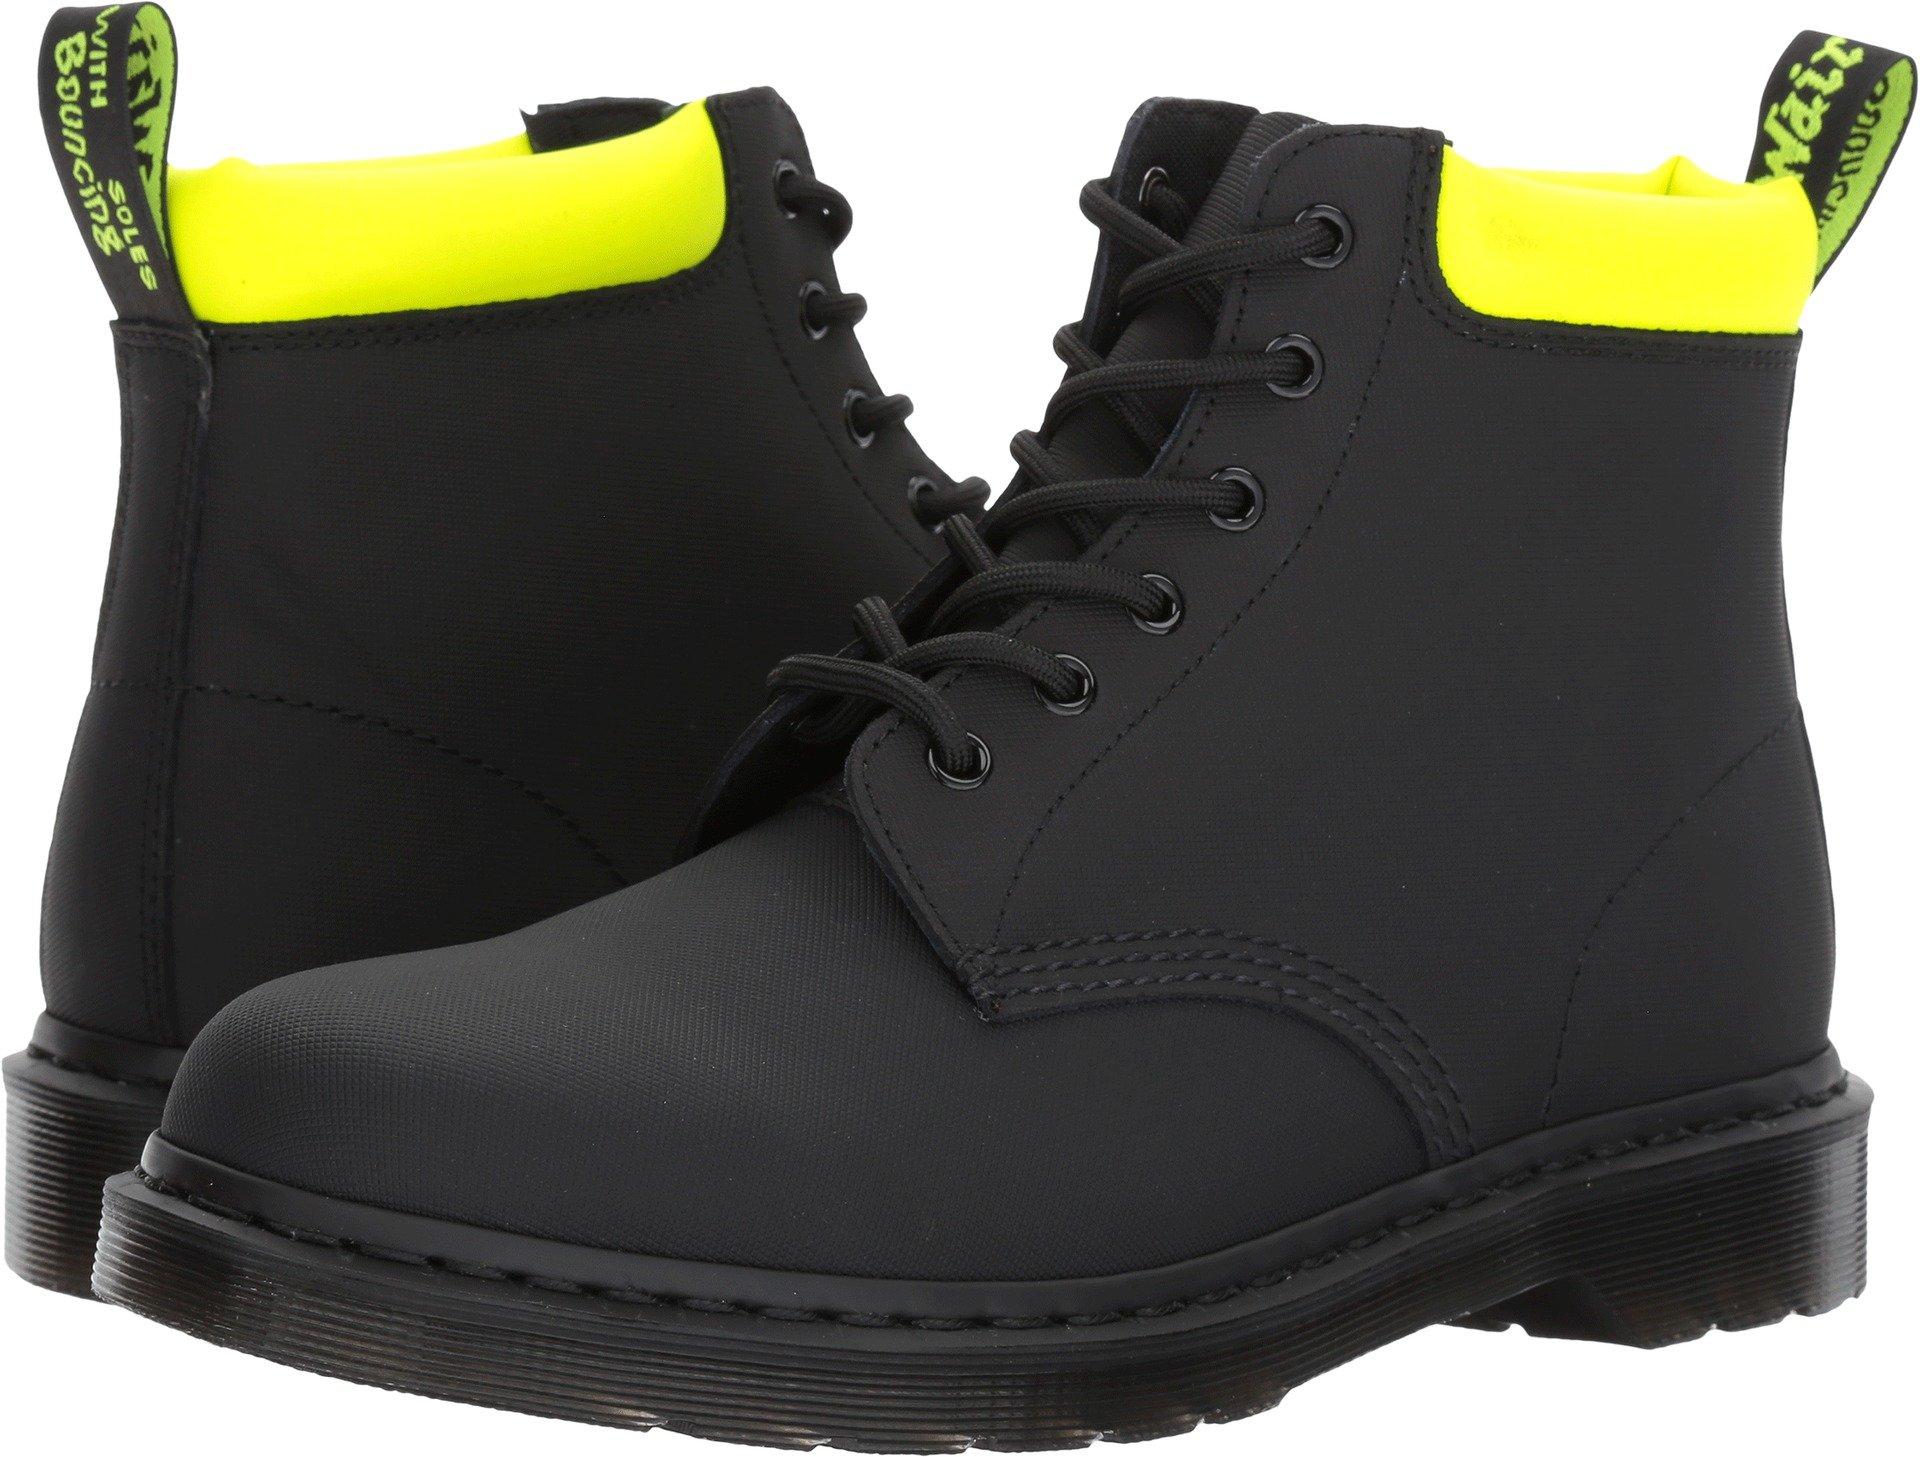 Dr. Martens R22869001 Men's 939 Boot, Black Ajax/Neon Yellow Pu - 9 UK/10 D(M) US